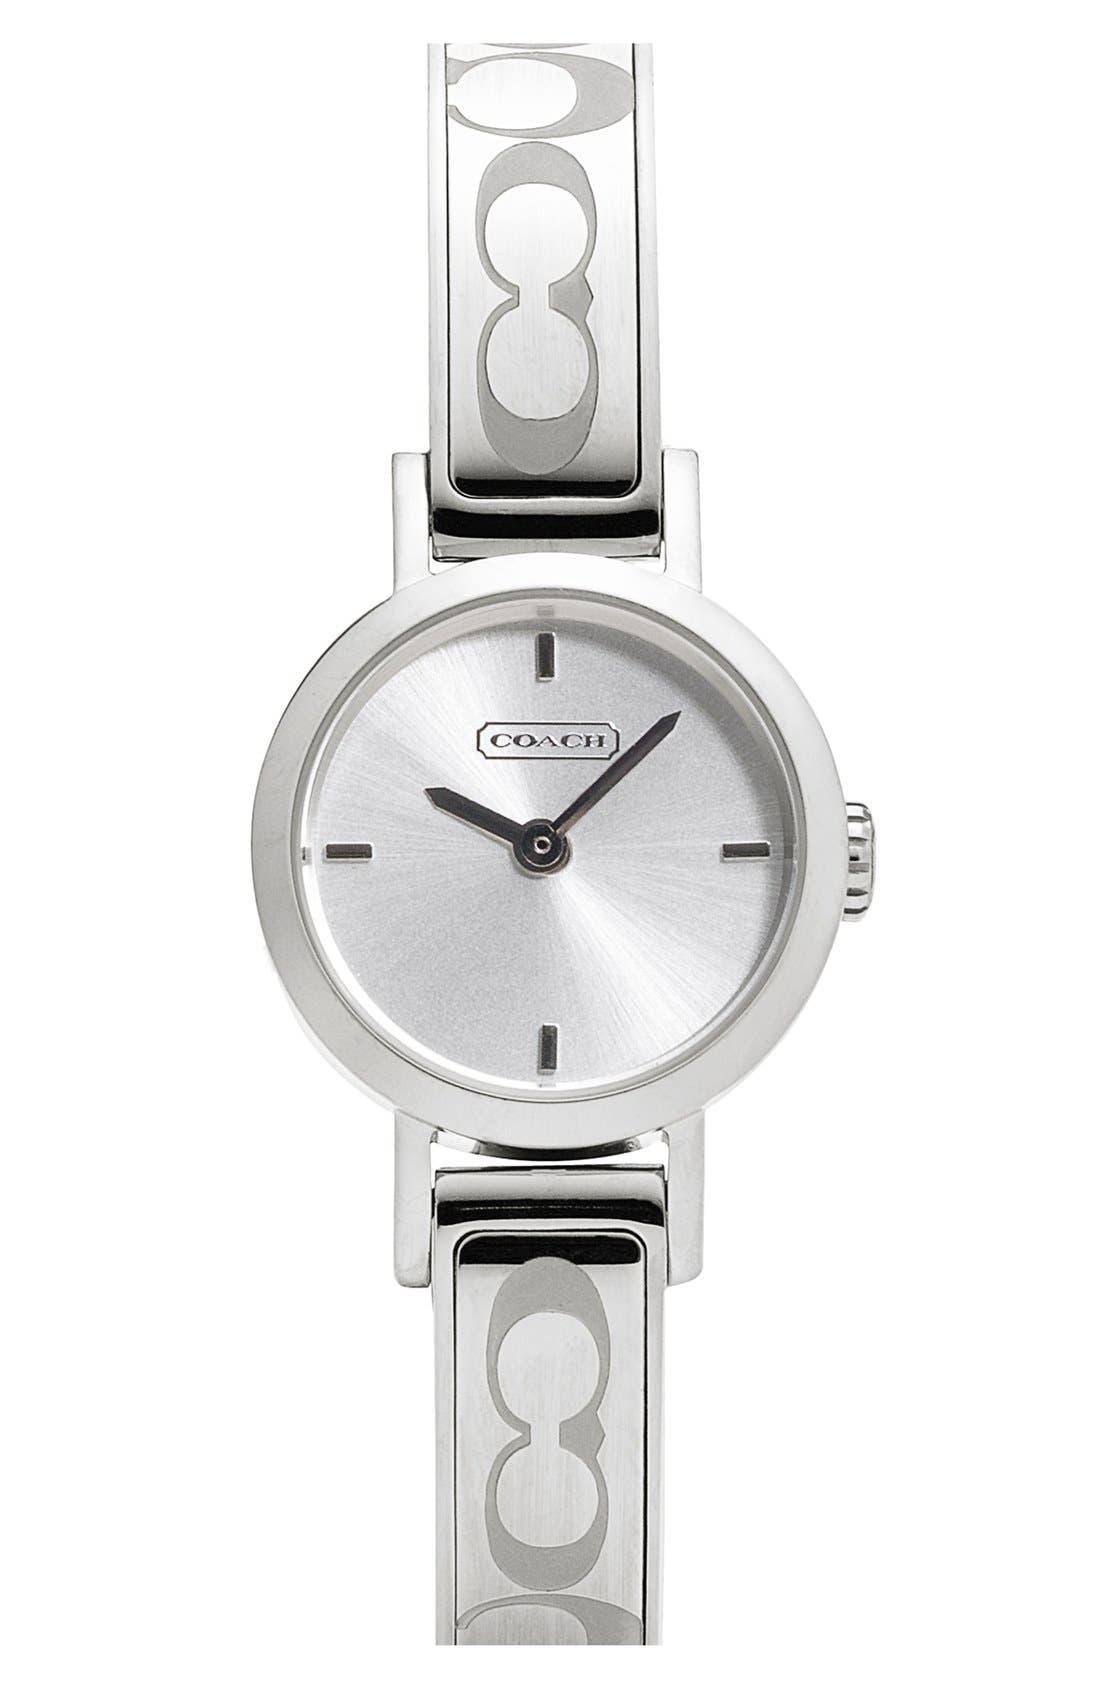 Alternate Image 1 Selected - COACH 'Signature Studio' Bangle Watch, 22mm